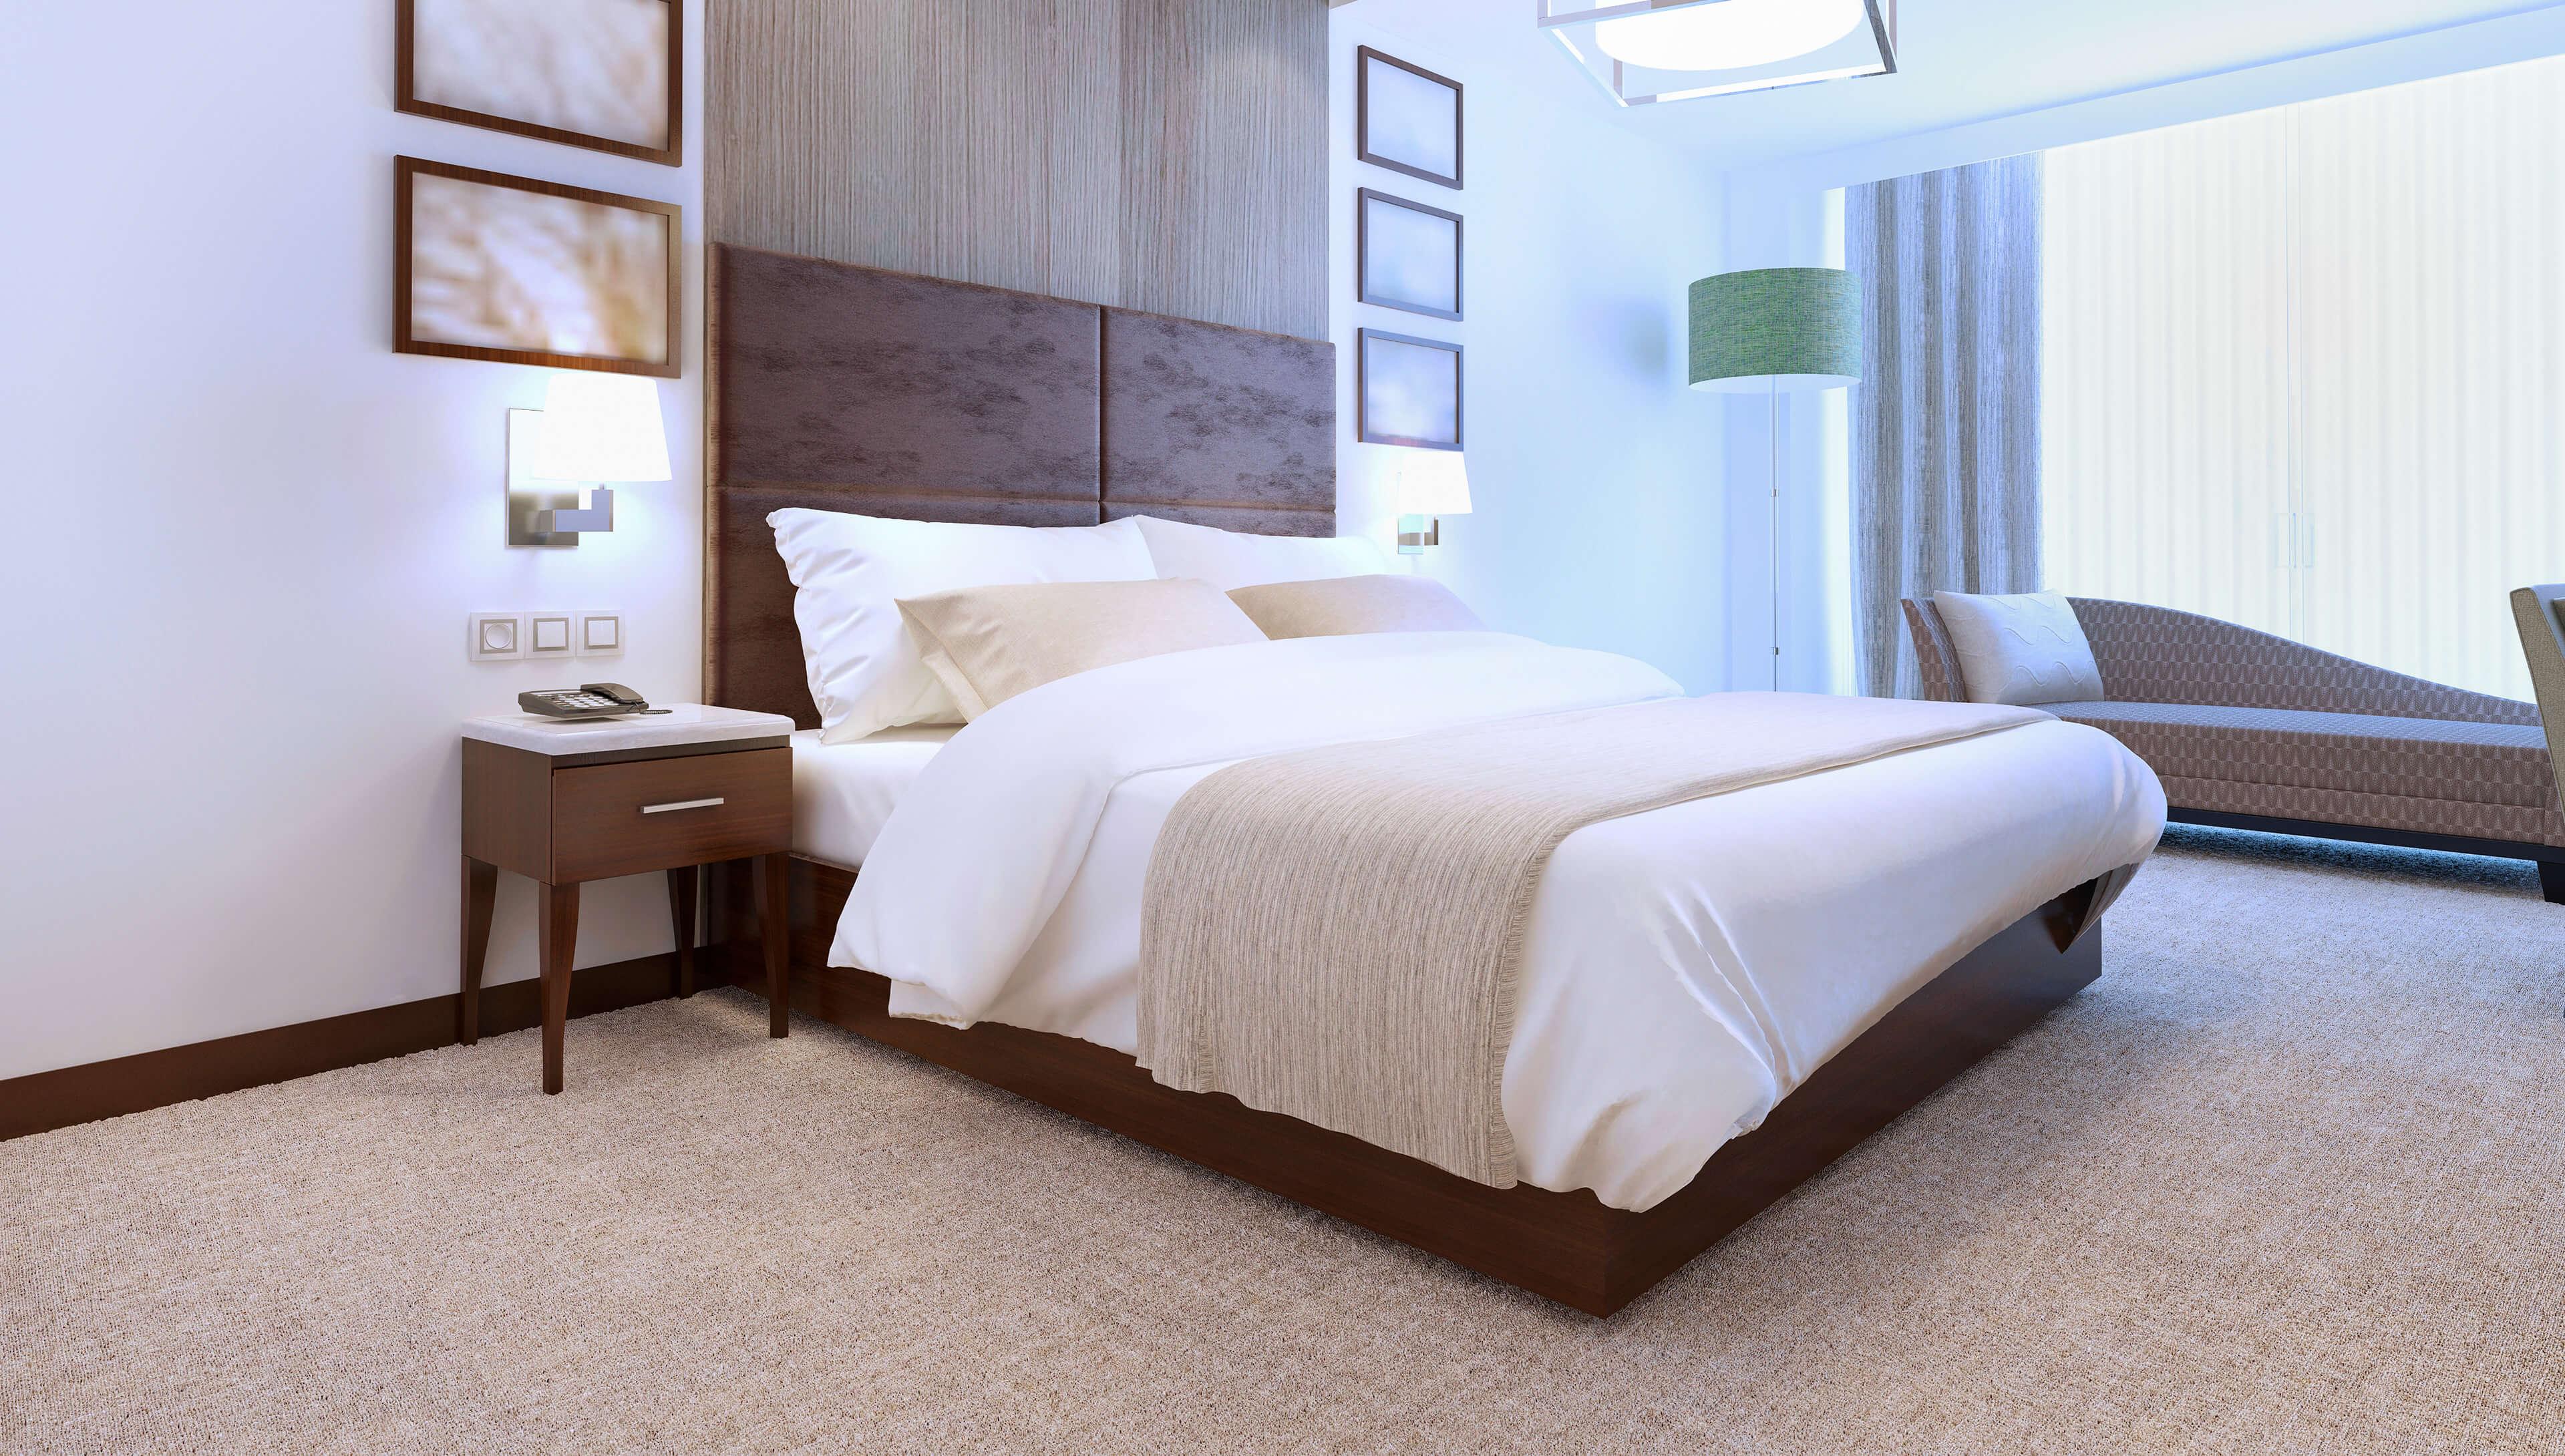 adding laminate wood floor to adjacent room with hardwood